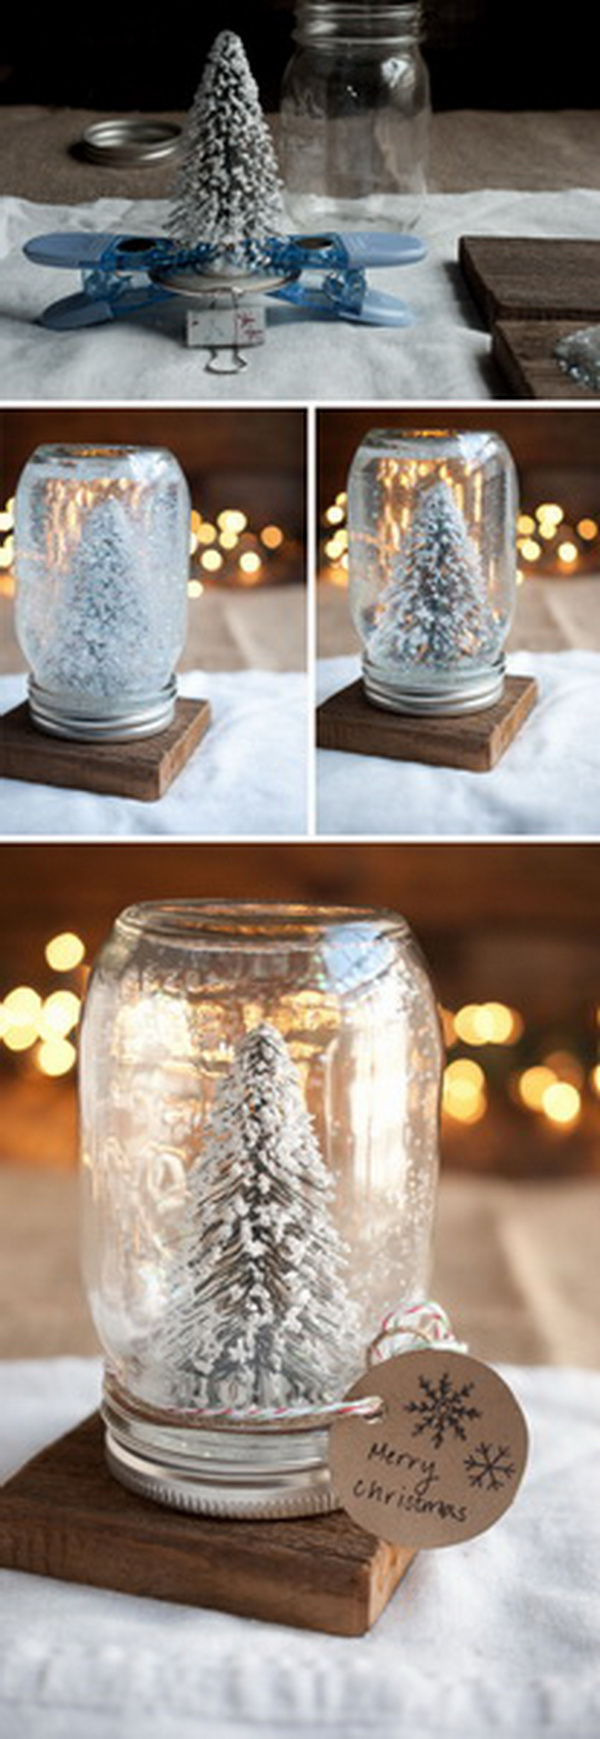 Creative ways to use mason jars this christmas for for Christmas table decorations using mason jars